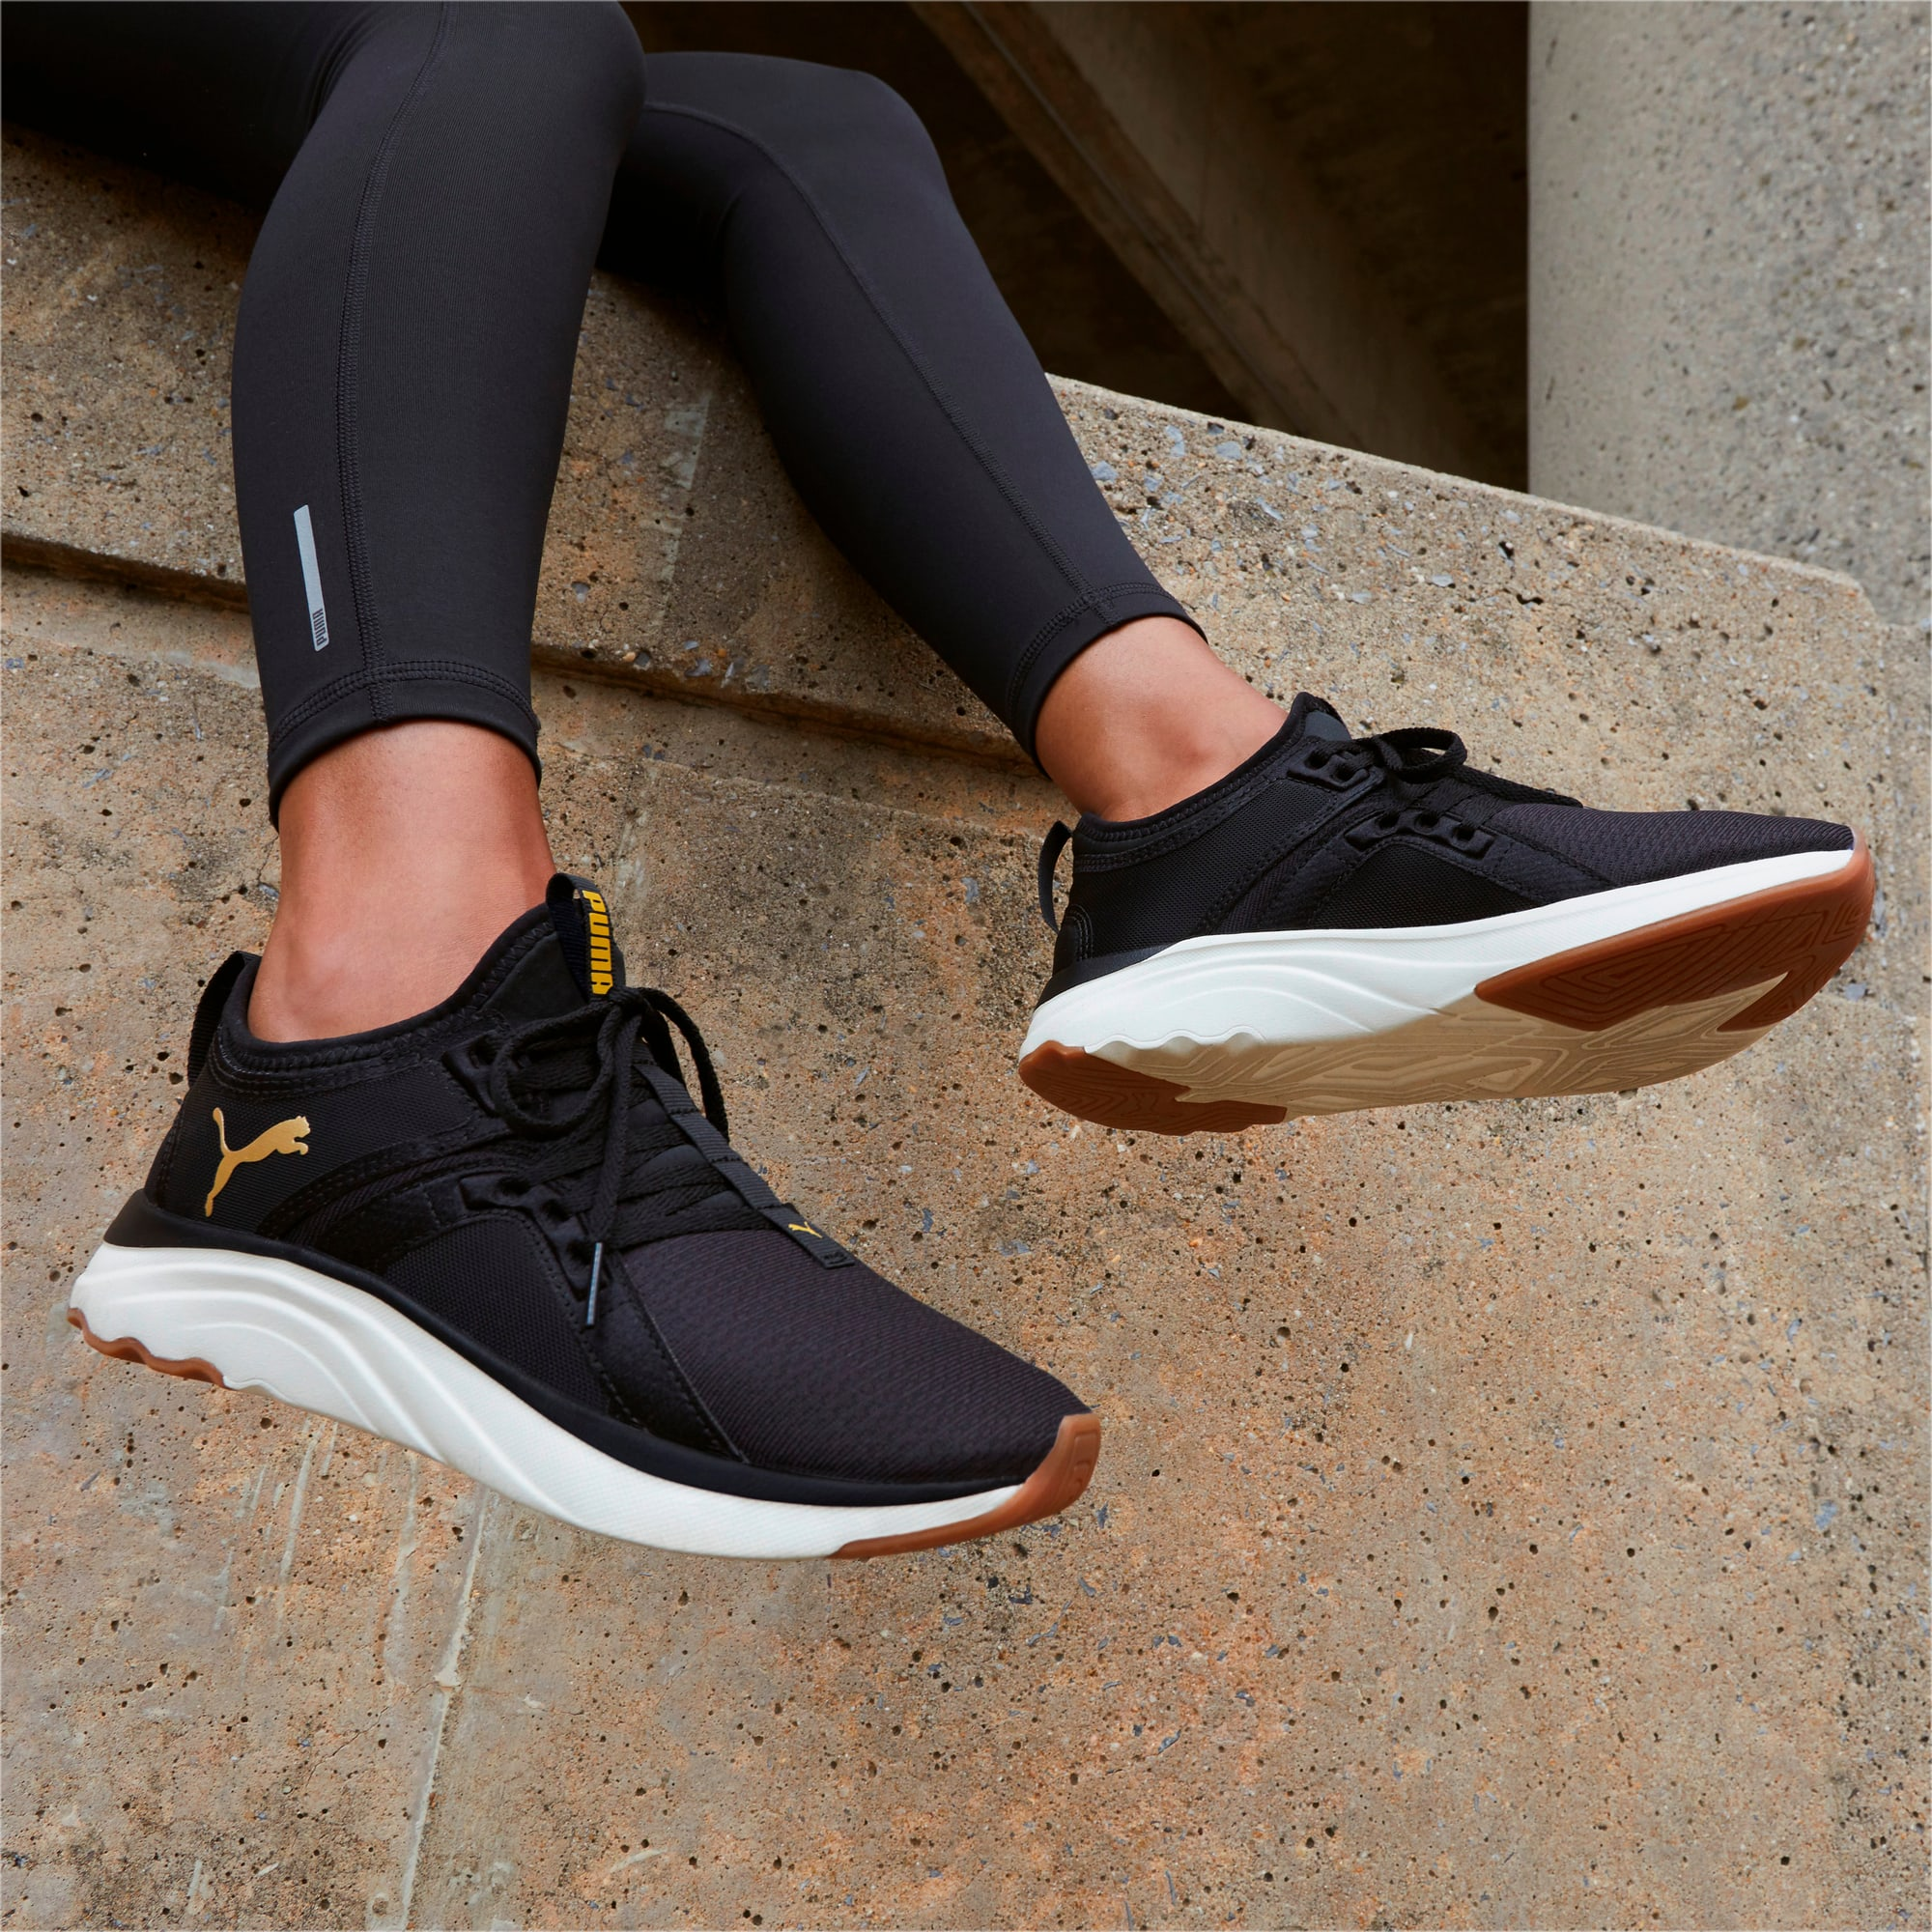 SoftRide Sophia Eco Women's Running Shoes